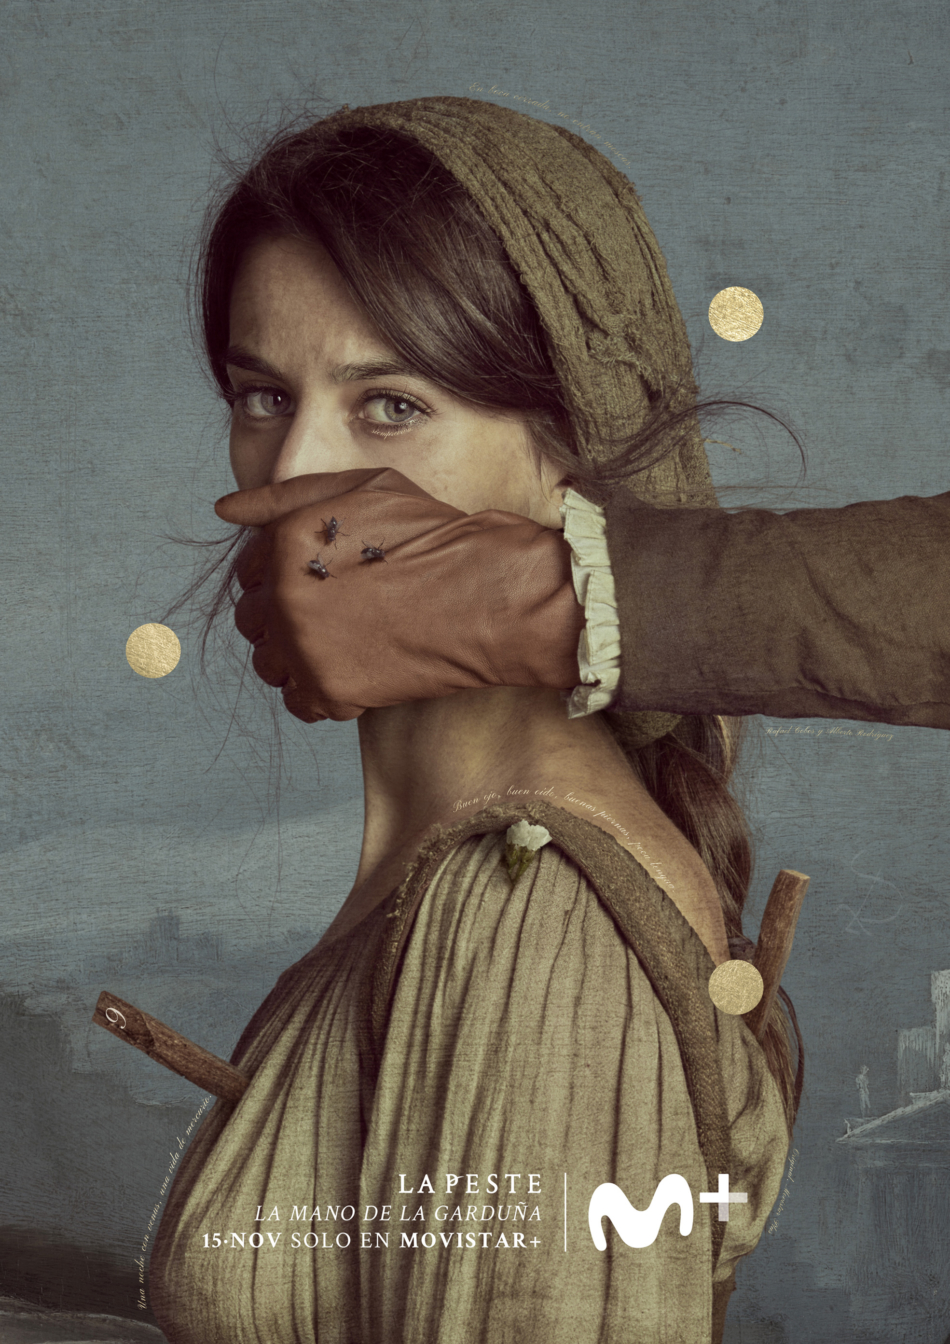 Valero Rioja Photography campaign La Peste 4